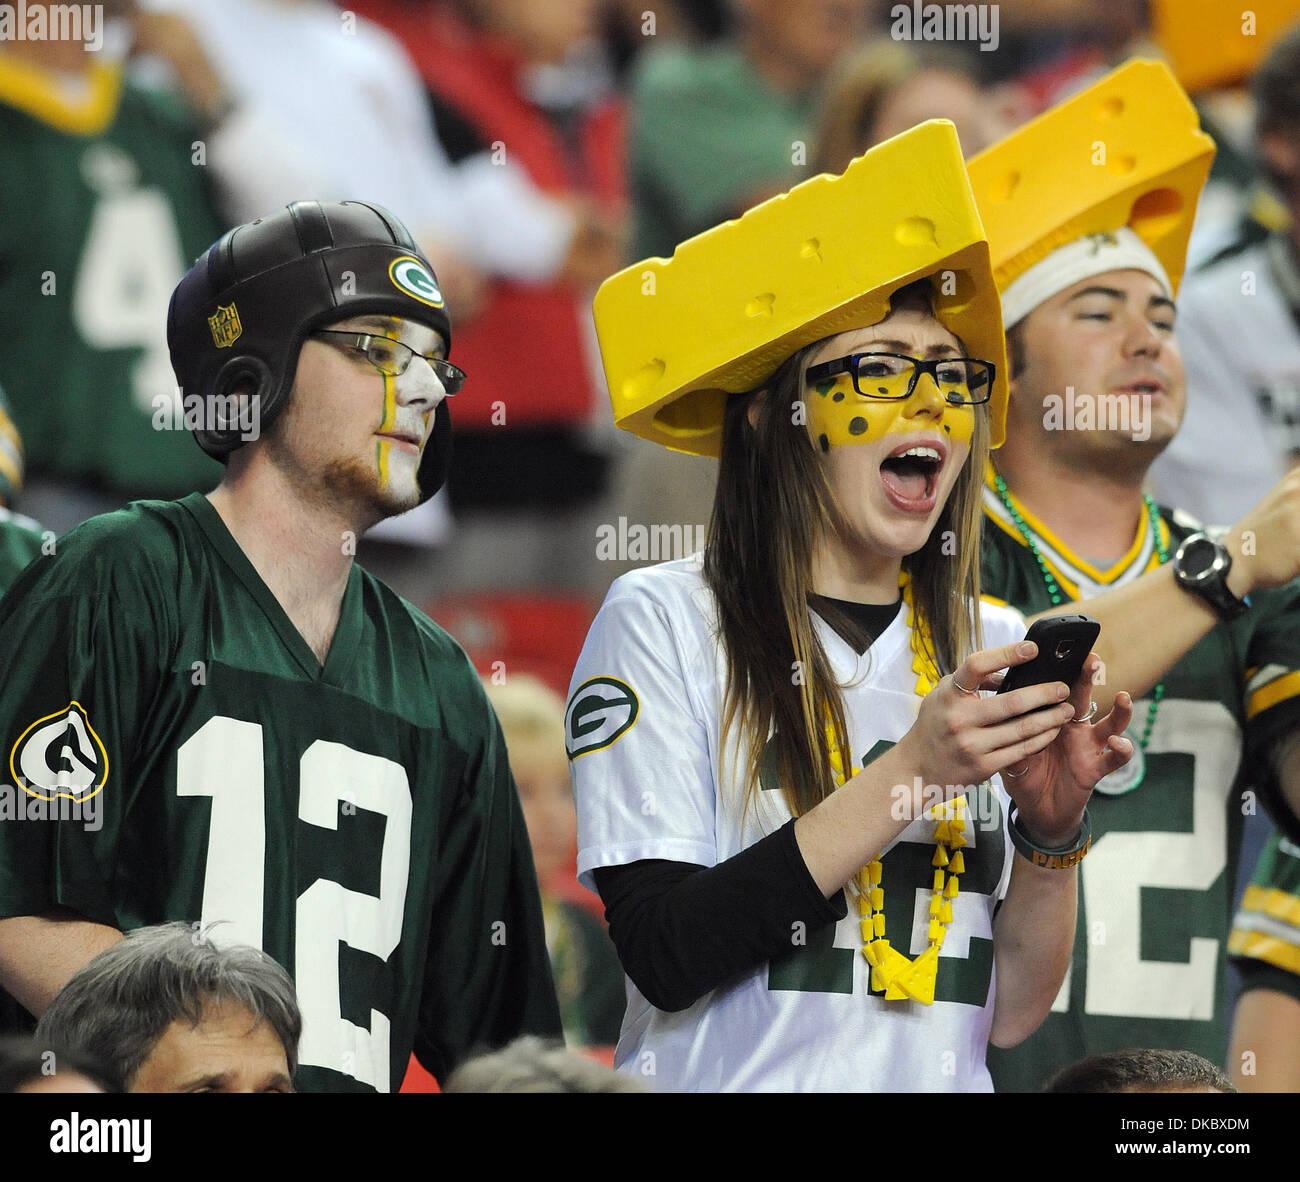 8c5822b1b Green Bay Packers Fans Stock Photos   Green Bay Packers Fans Stock ...